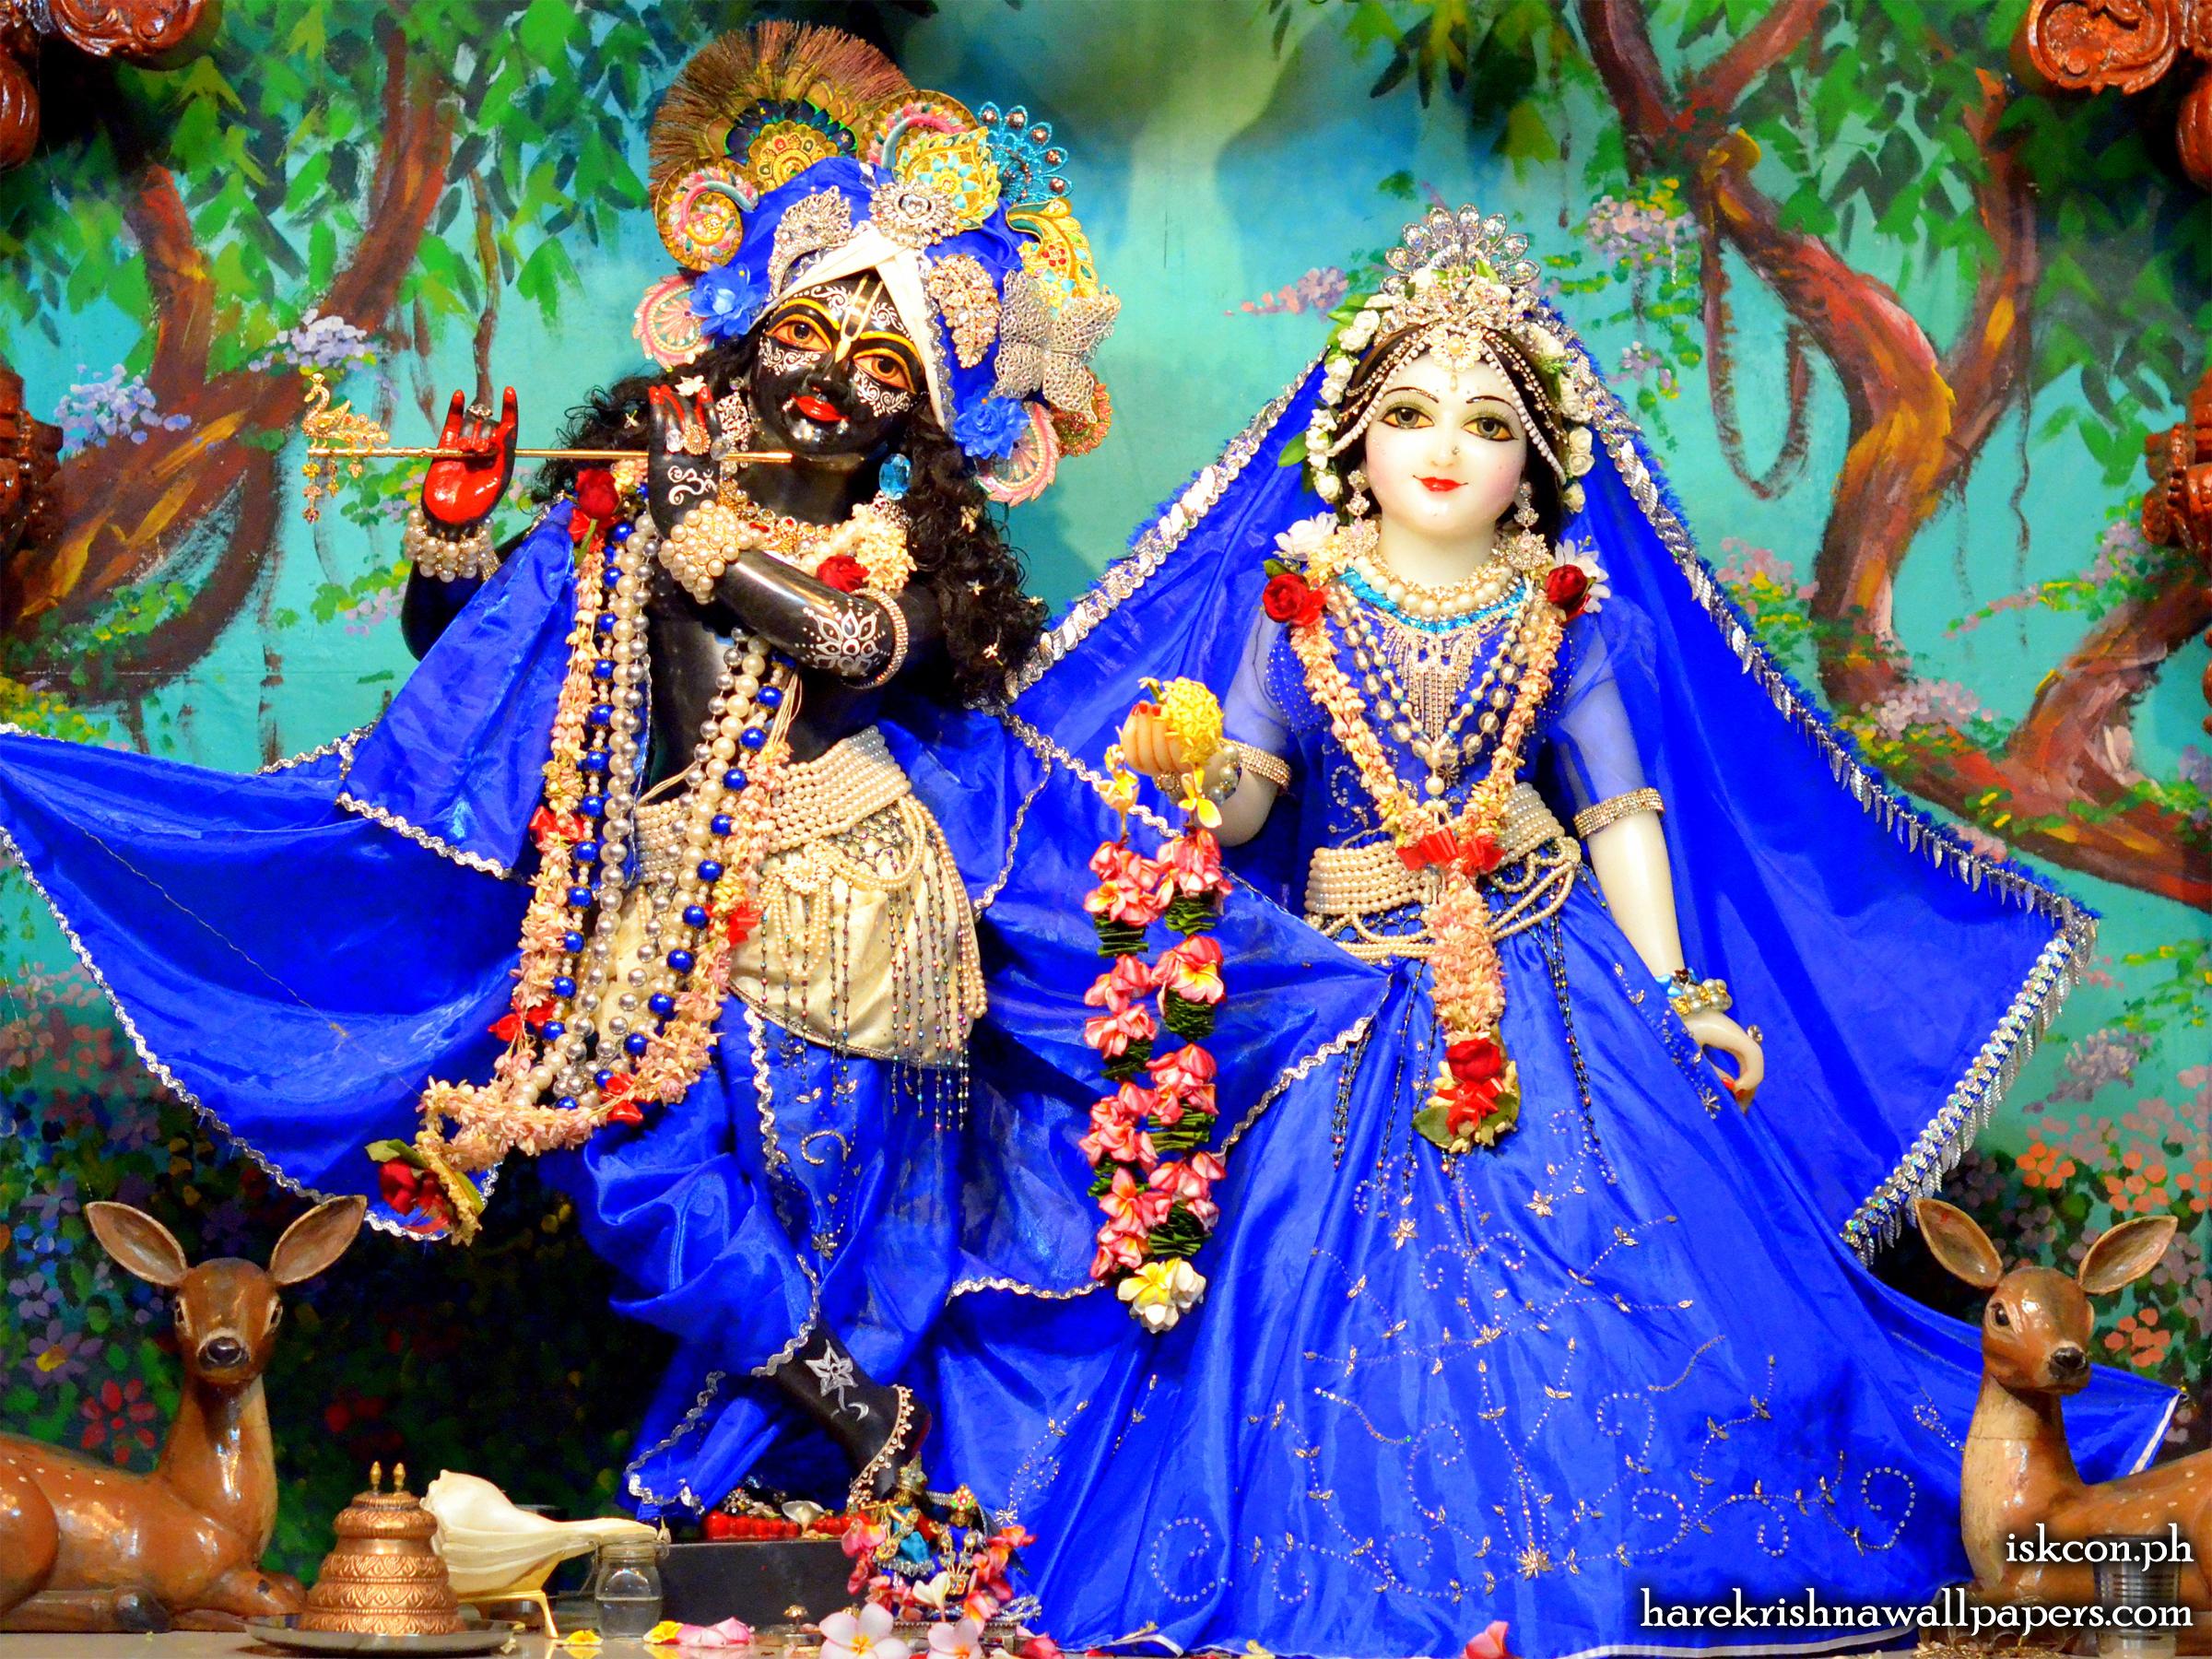 Sri Sri Radha Madhava Wallpaper (016) Size 2400x1800 Download